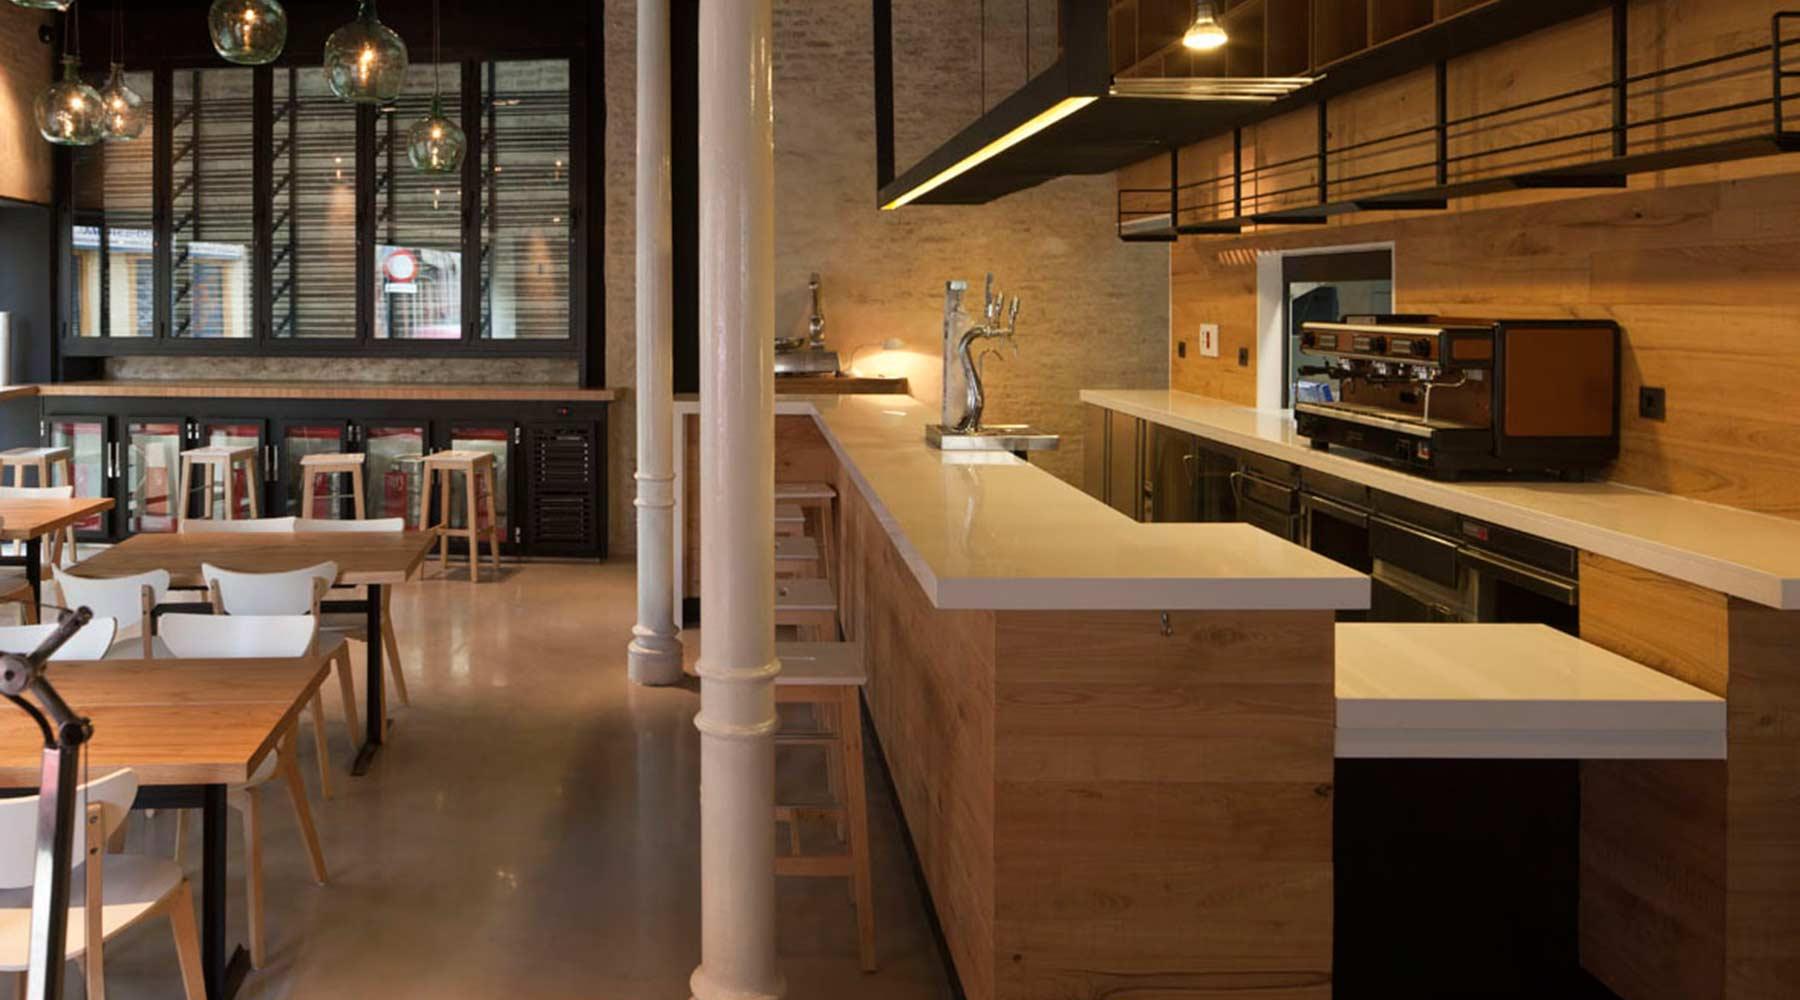 Detalle interior muebles para bares (Pacatar bar)